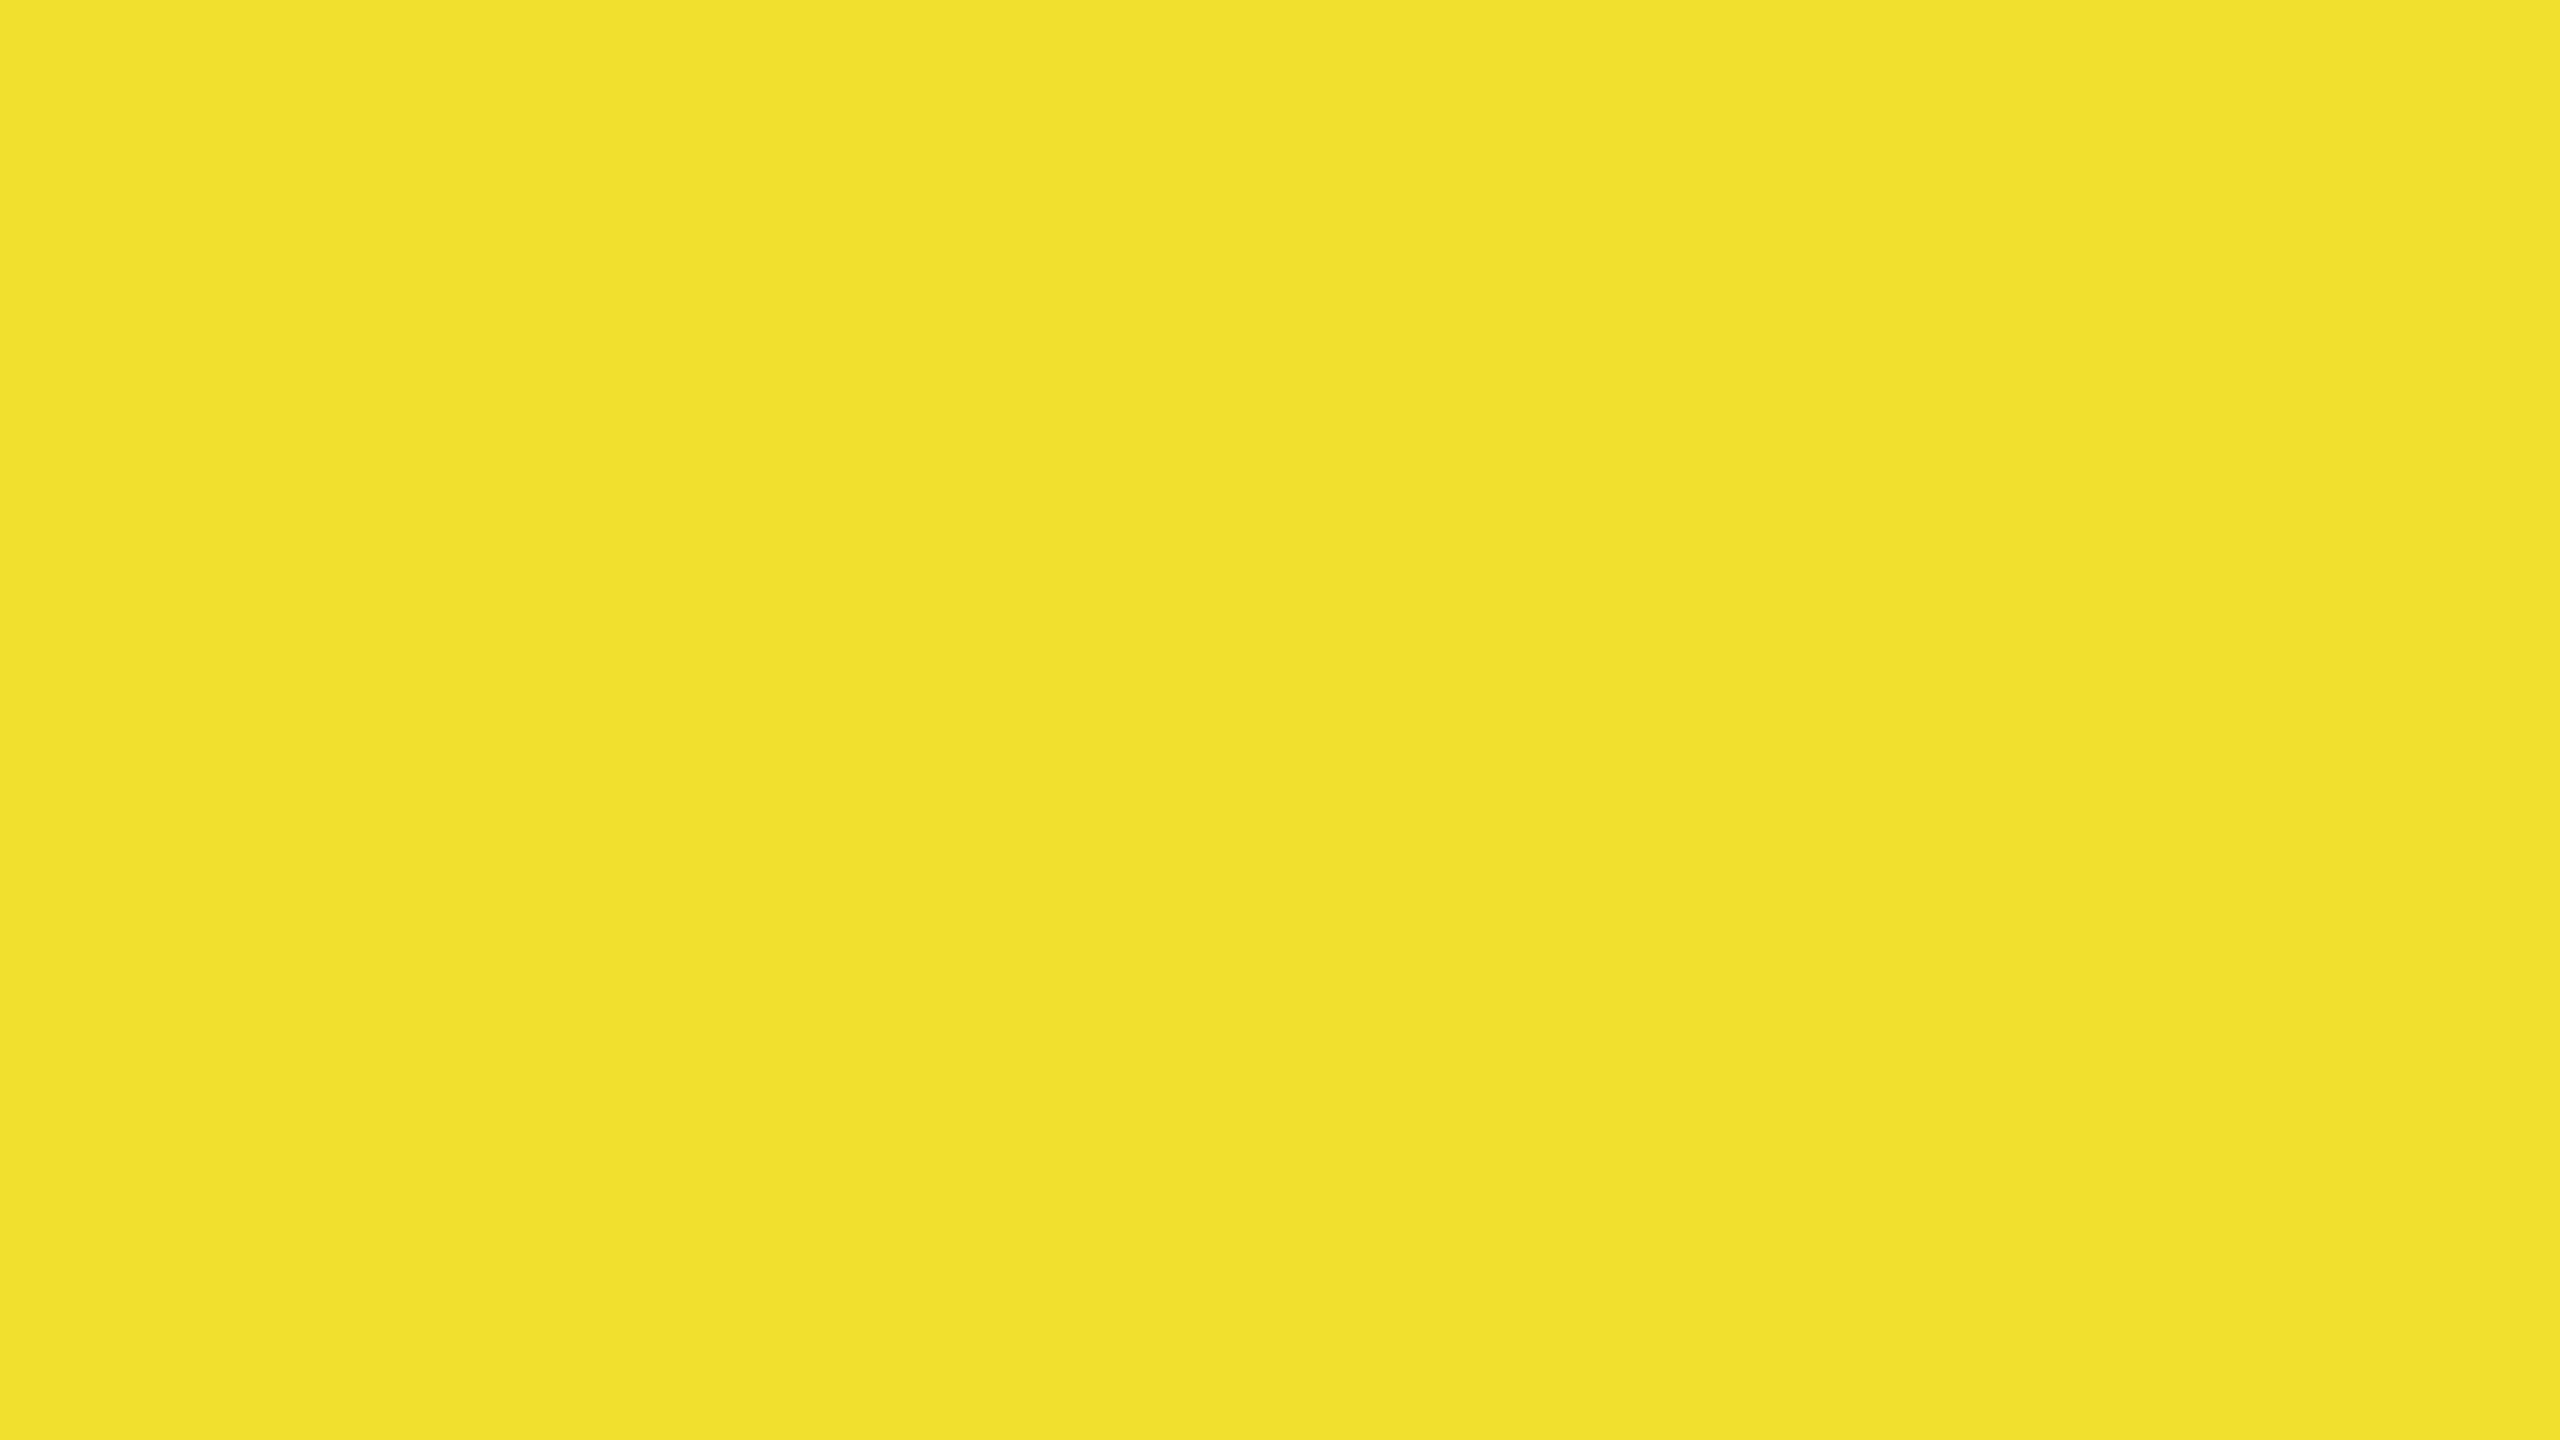 2560x1440 Dandelion Solid Color Background